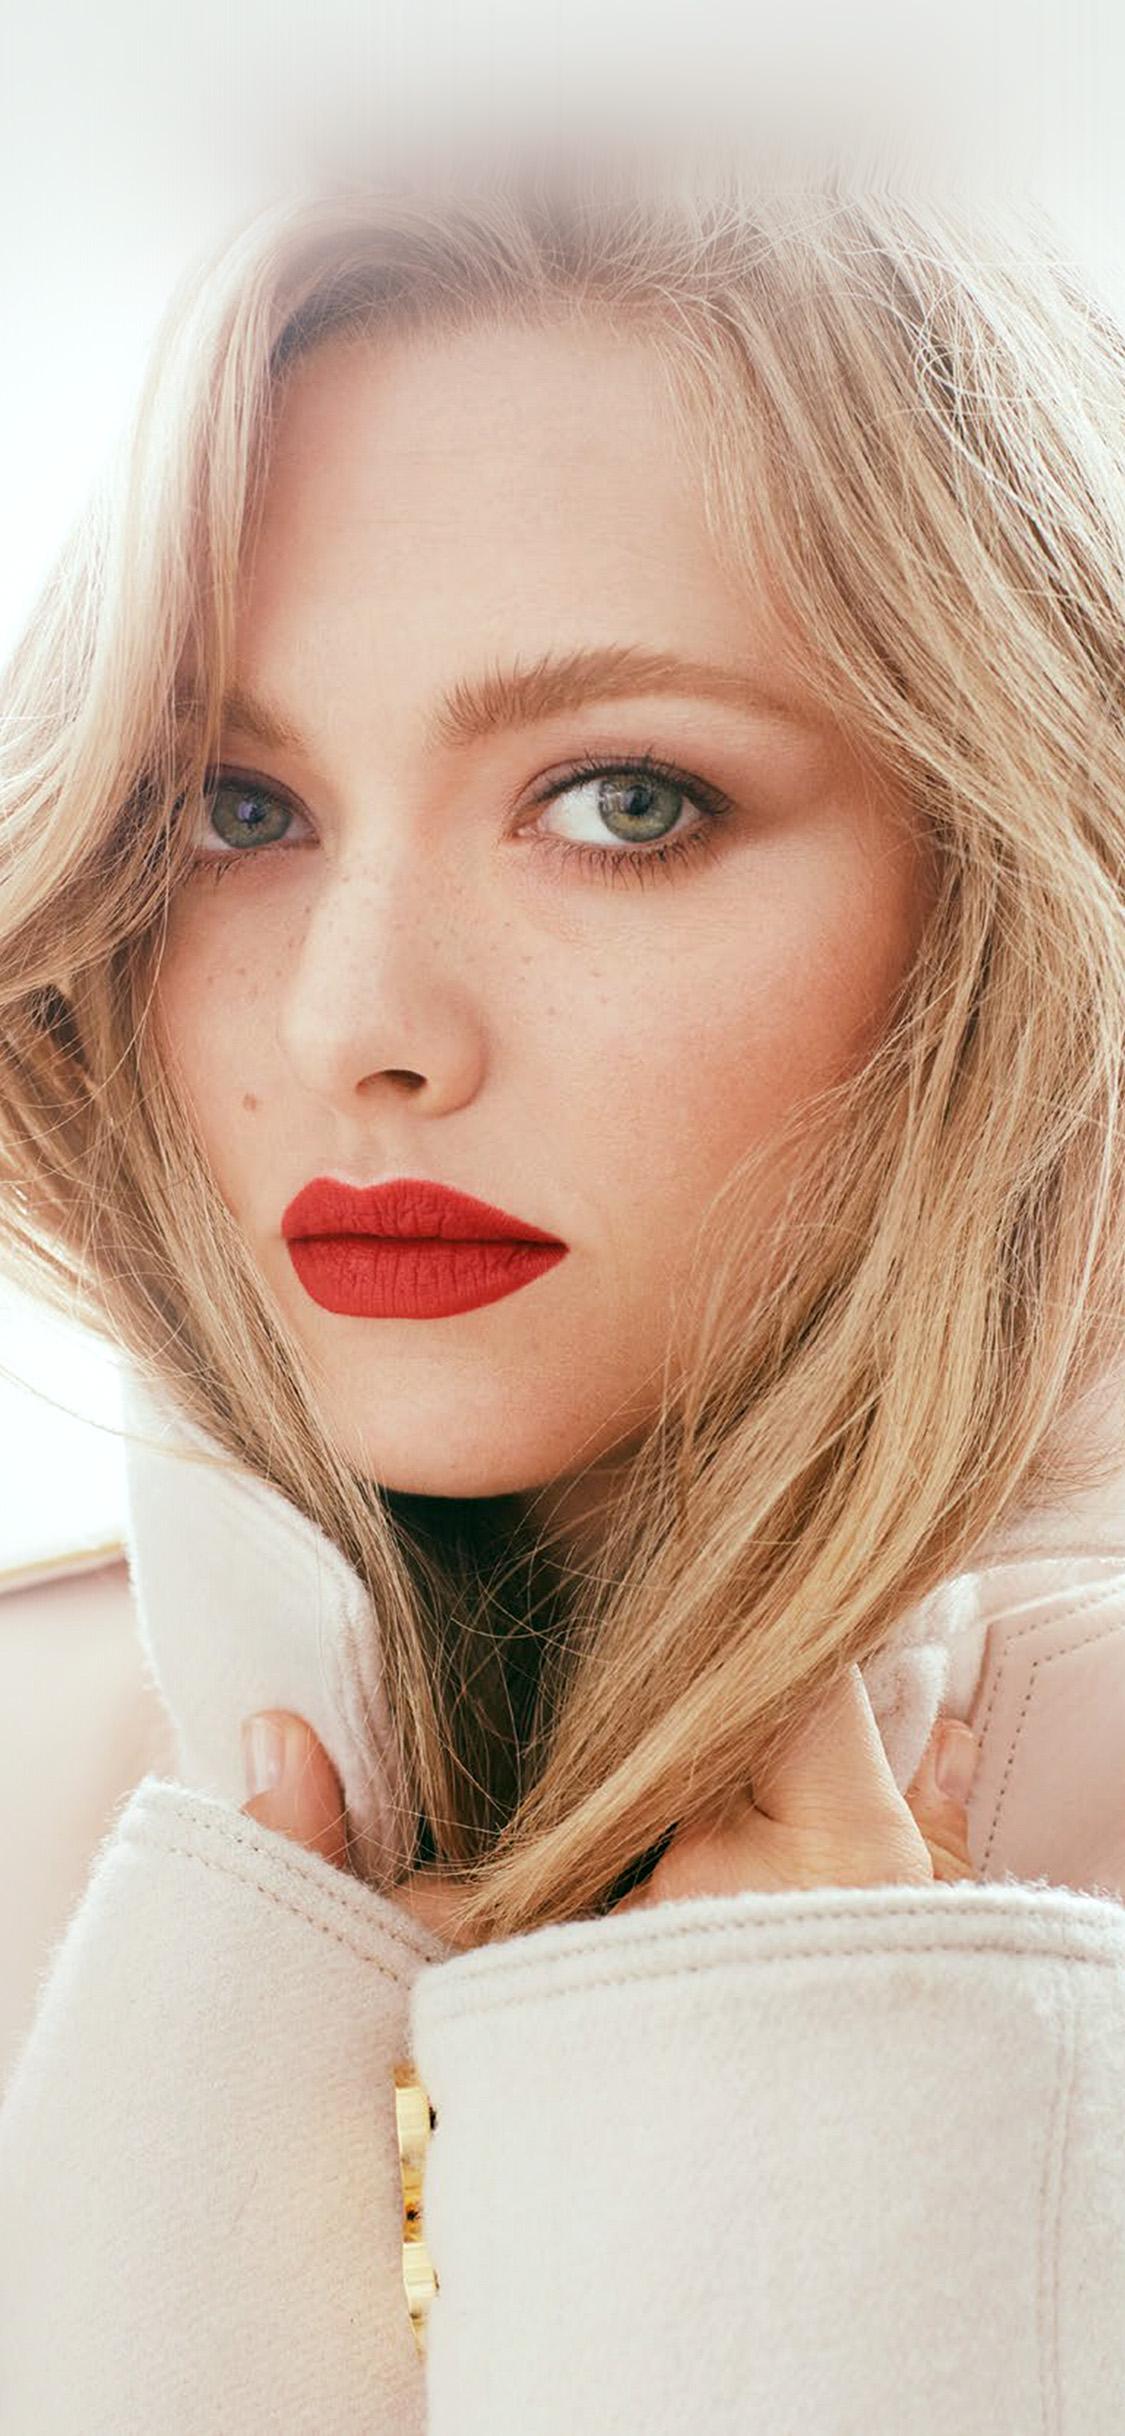 iPhonexpapers.com-Apple-iPhone-wallpaper-hr62-amanda-seyfried-girl-face-film-red-lips